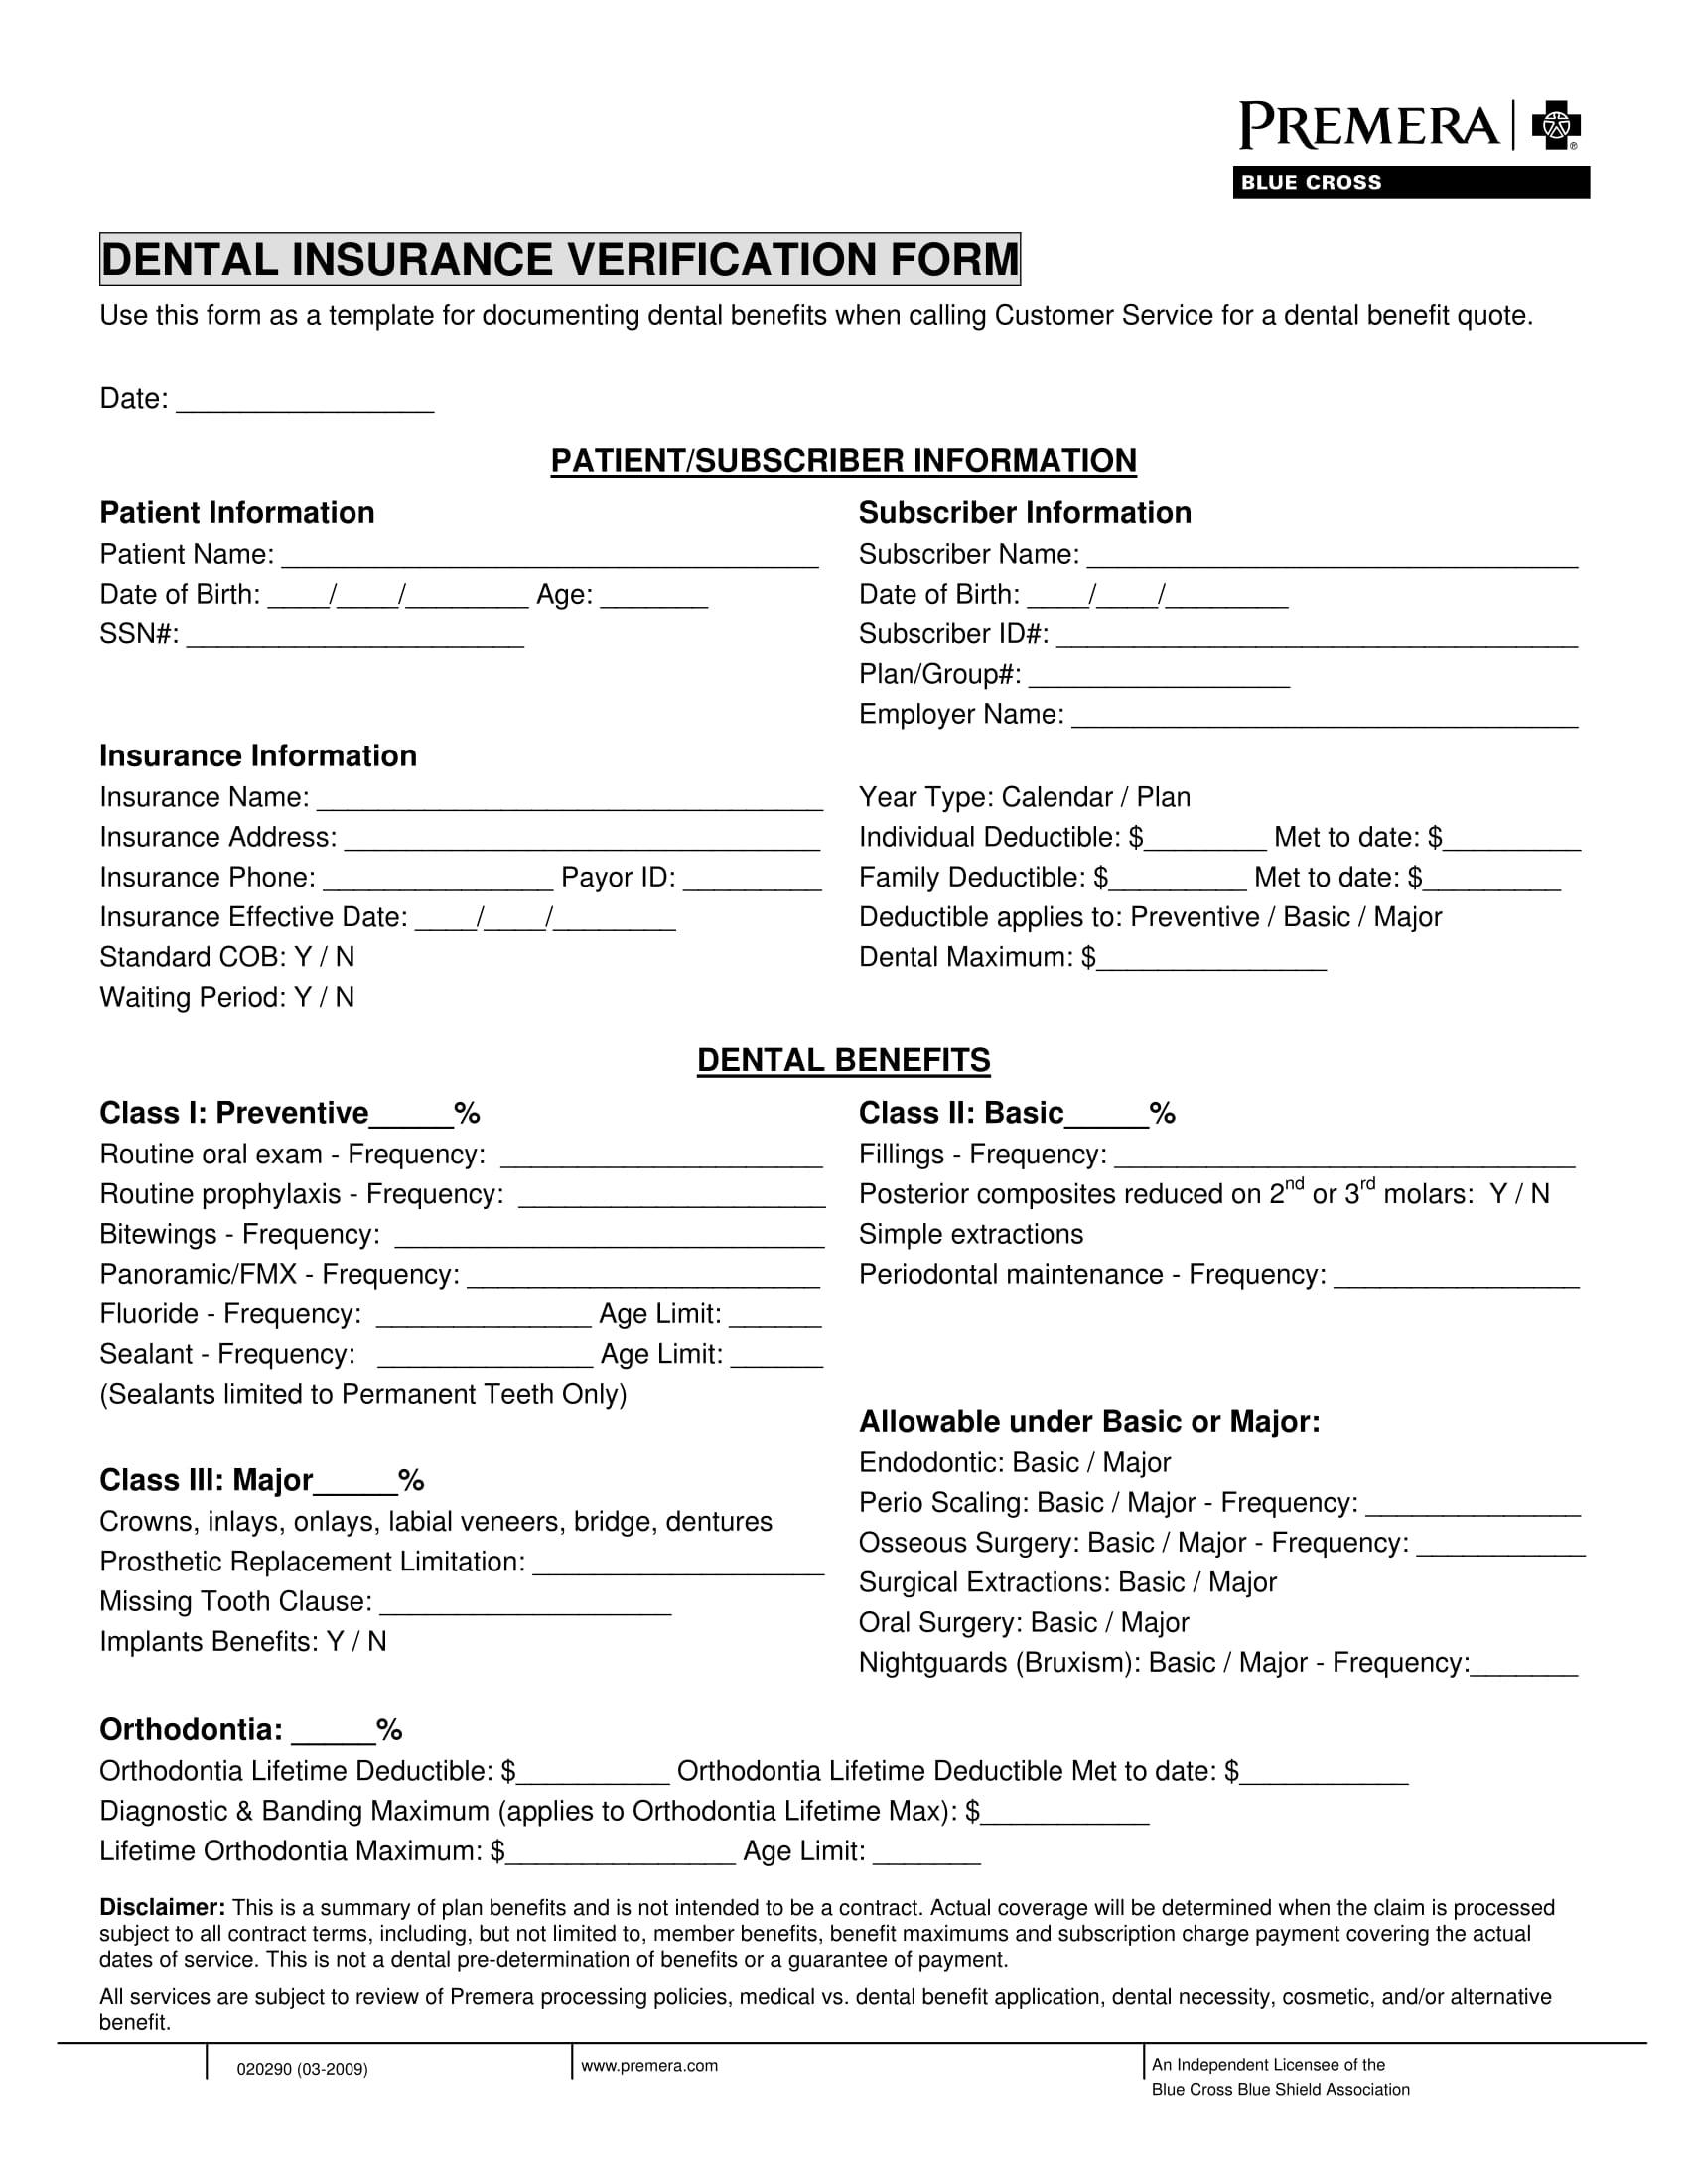 dental insurance verification form 1